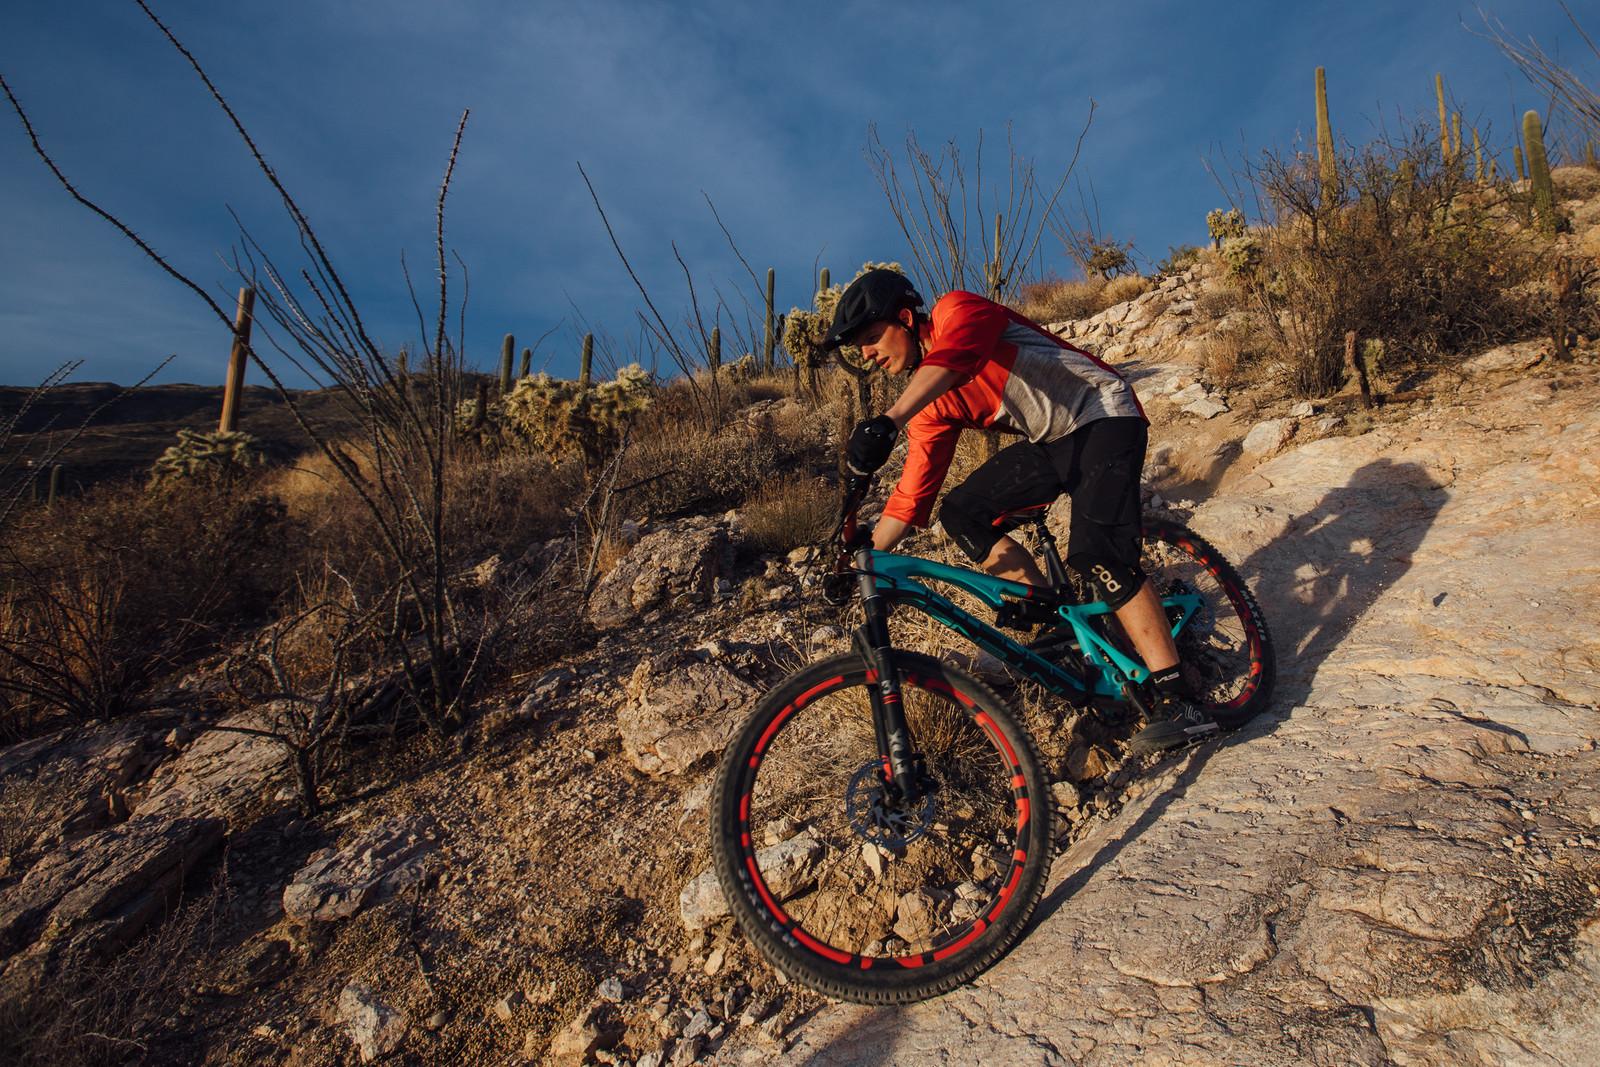 Intense Recluse Elite - 2017 Vital MTB Test Sessions - Intense Recluse Elite - 2017 Vital MTB Test Sessions - Mountain Biking Pictures - Vital MTB